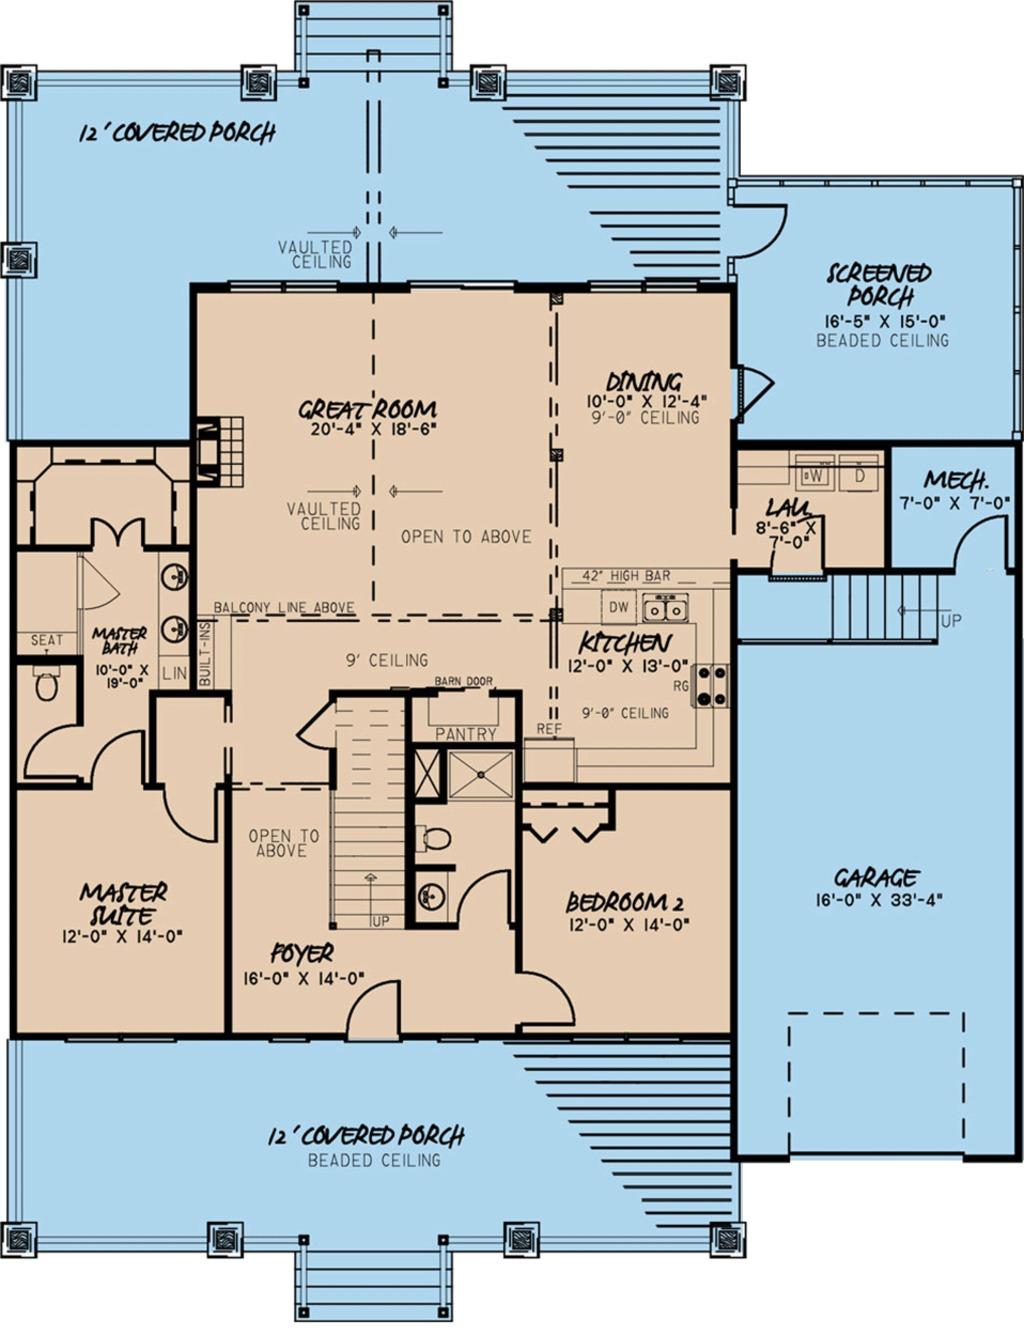 Craftsman Style House Plan - 4 Beds 3 Baths 2663 Sq/Ft Plan